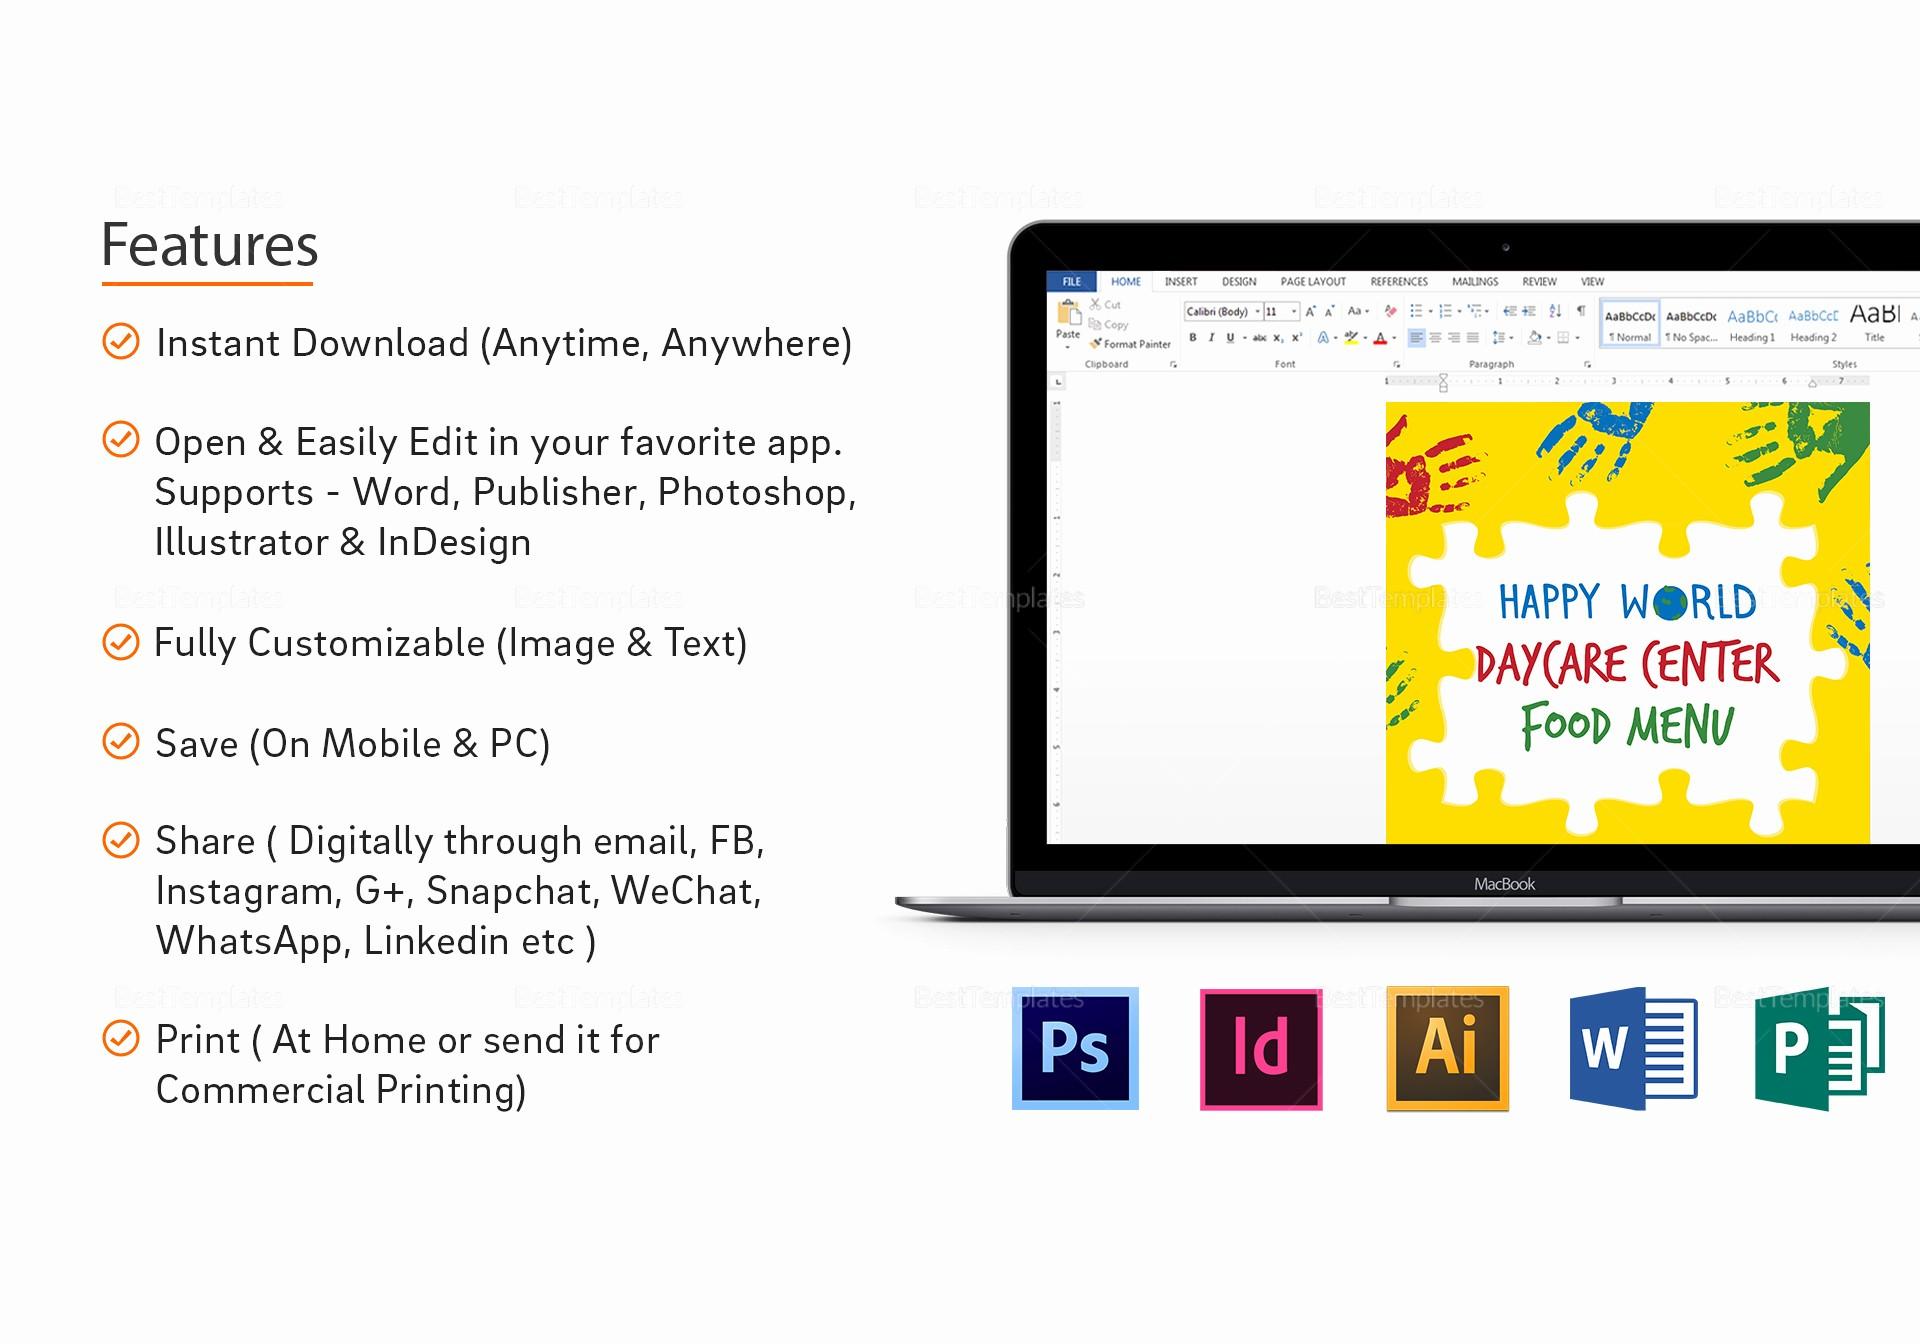 Daycare Menu Templates Free Download Unique Daycare Center Menu Design Template In Psd Word